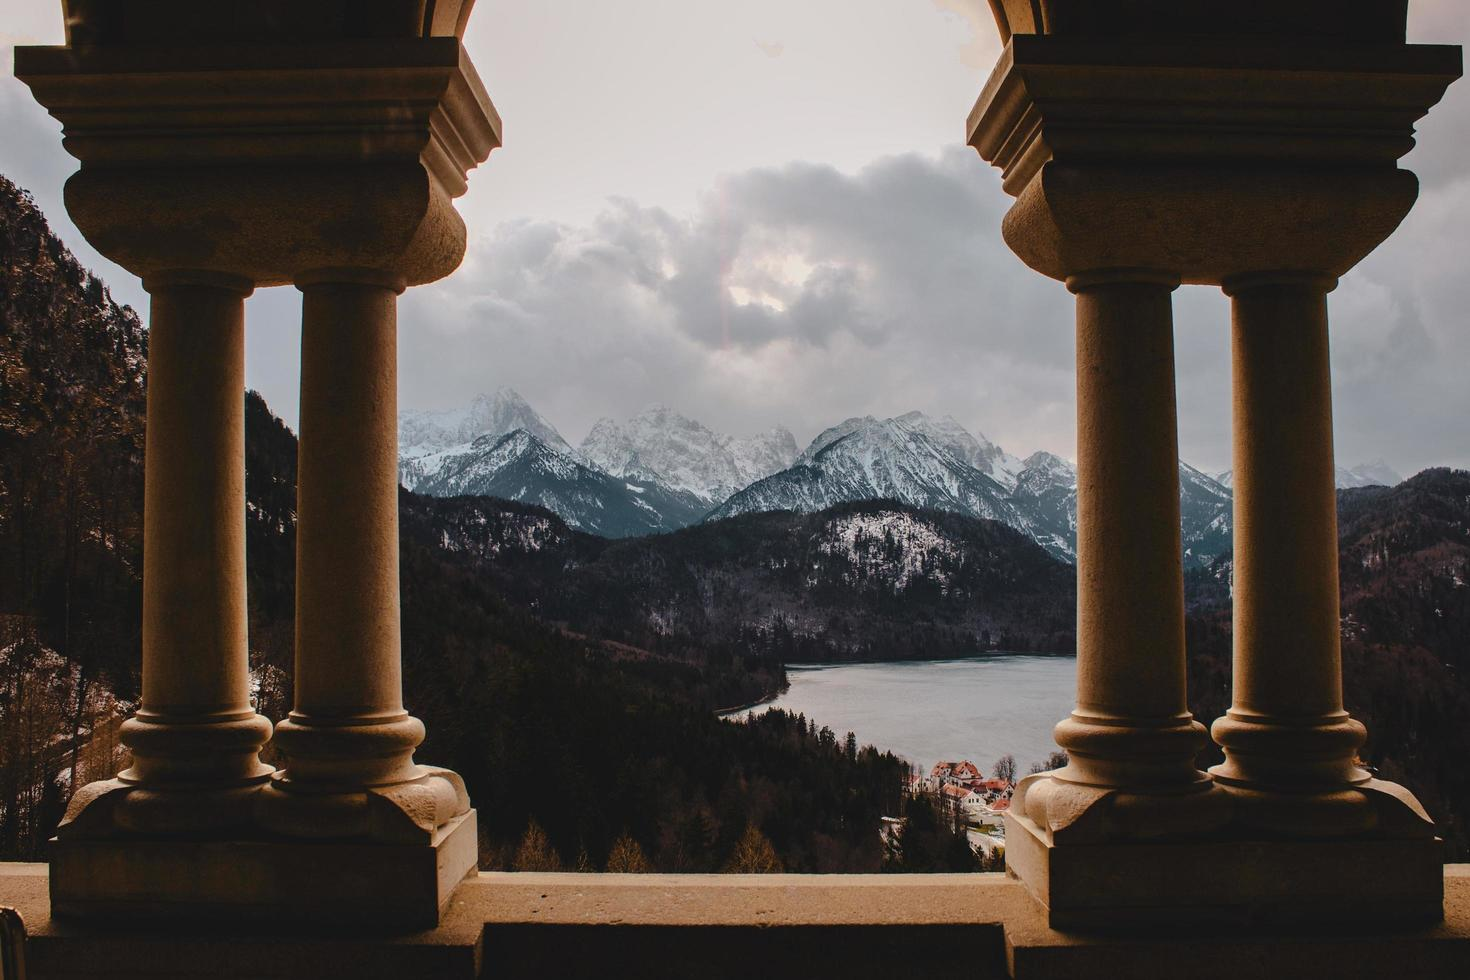 Mountain range framed by columns photo